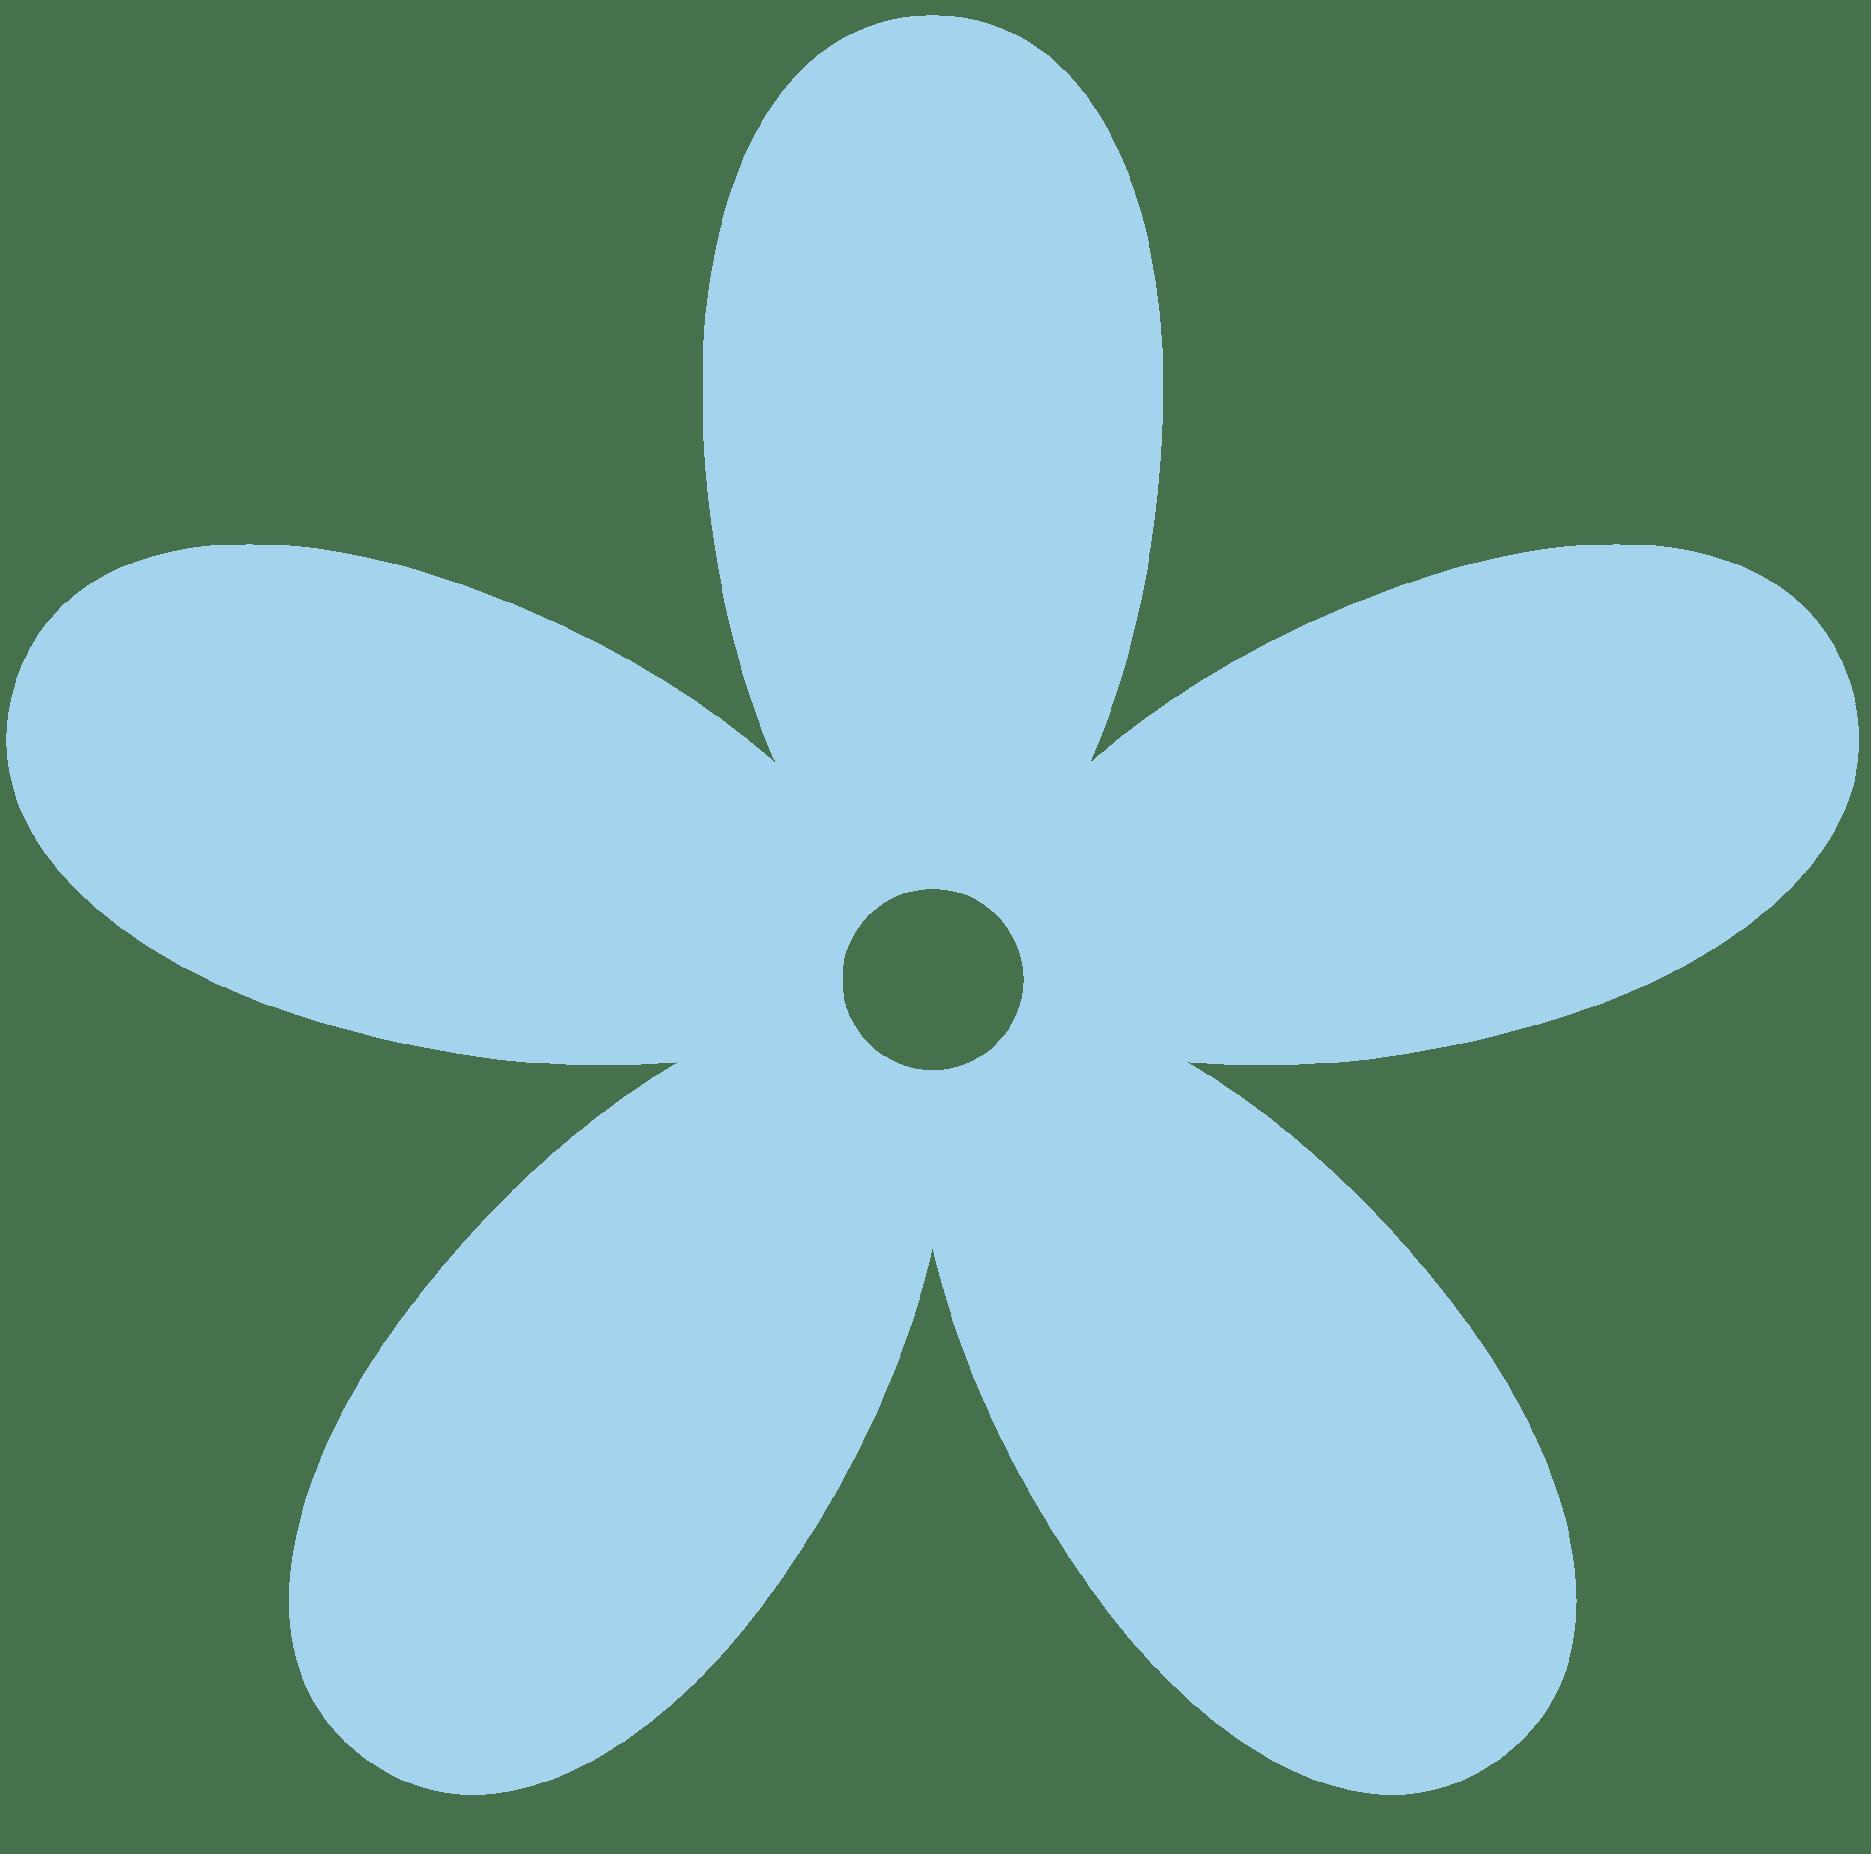 Light blue flower clipart 2 » Clipart Portal.